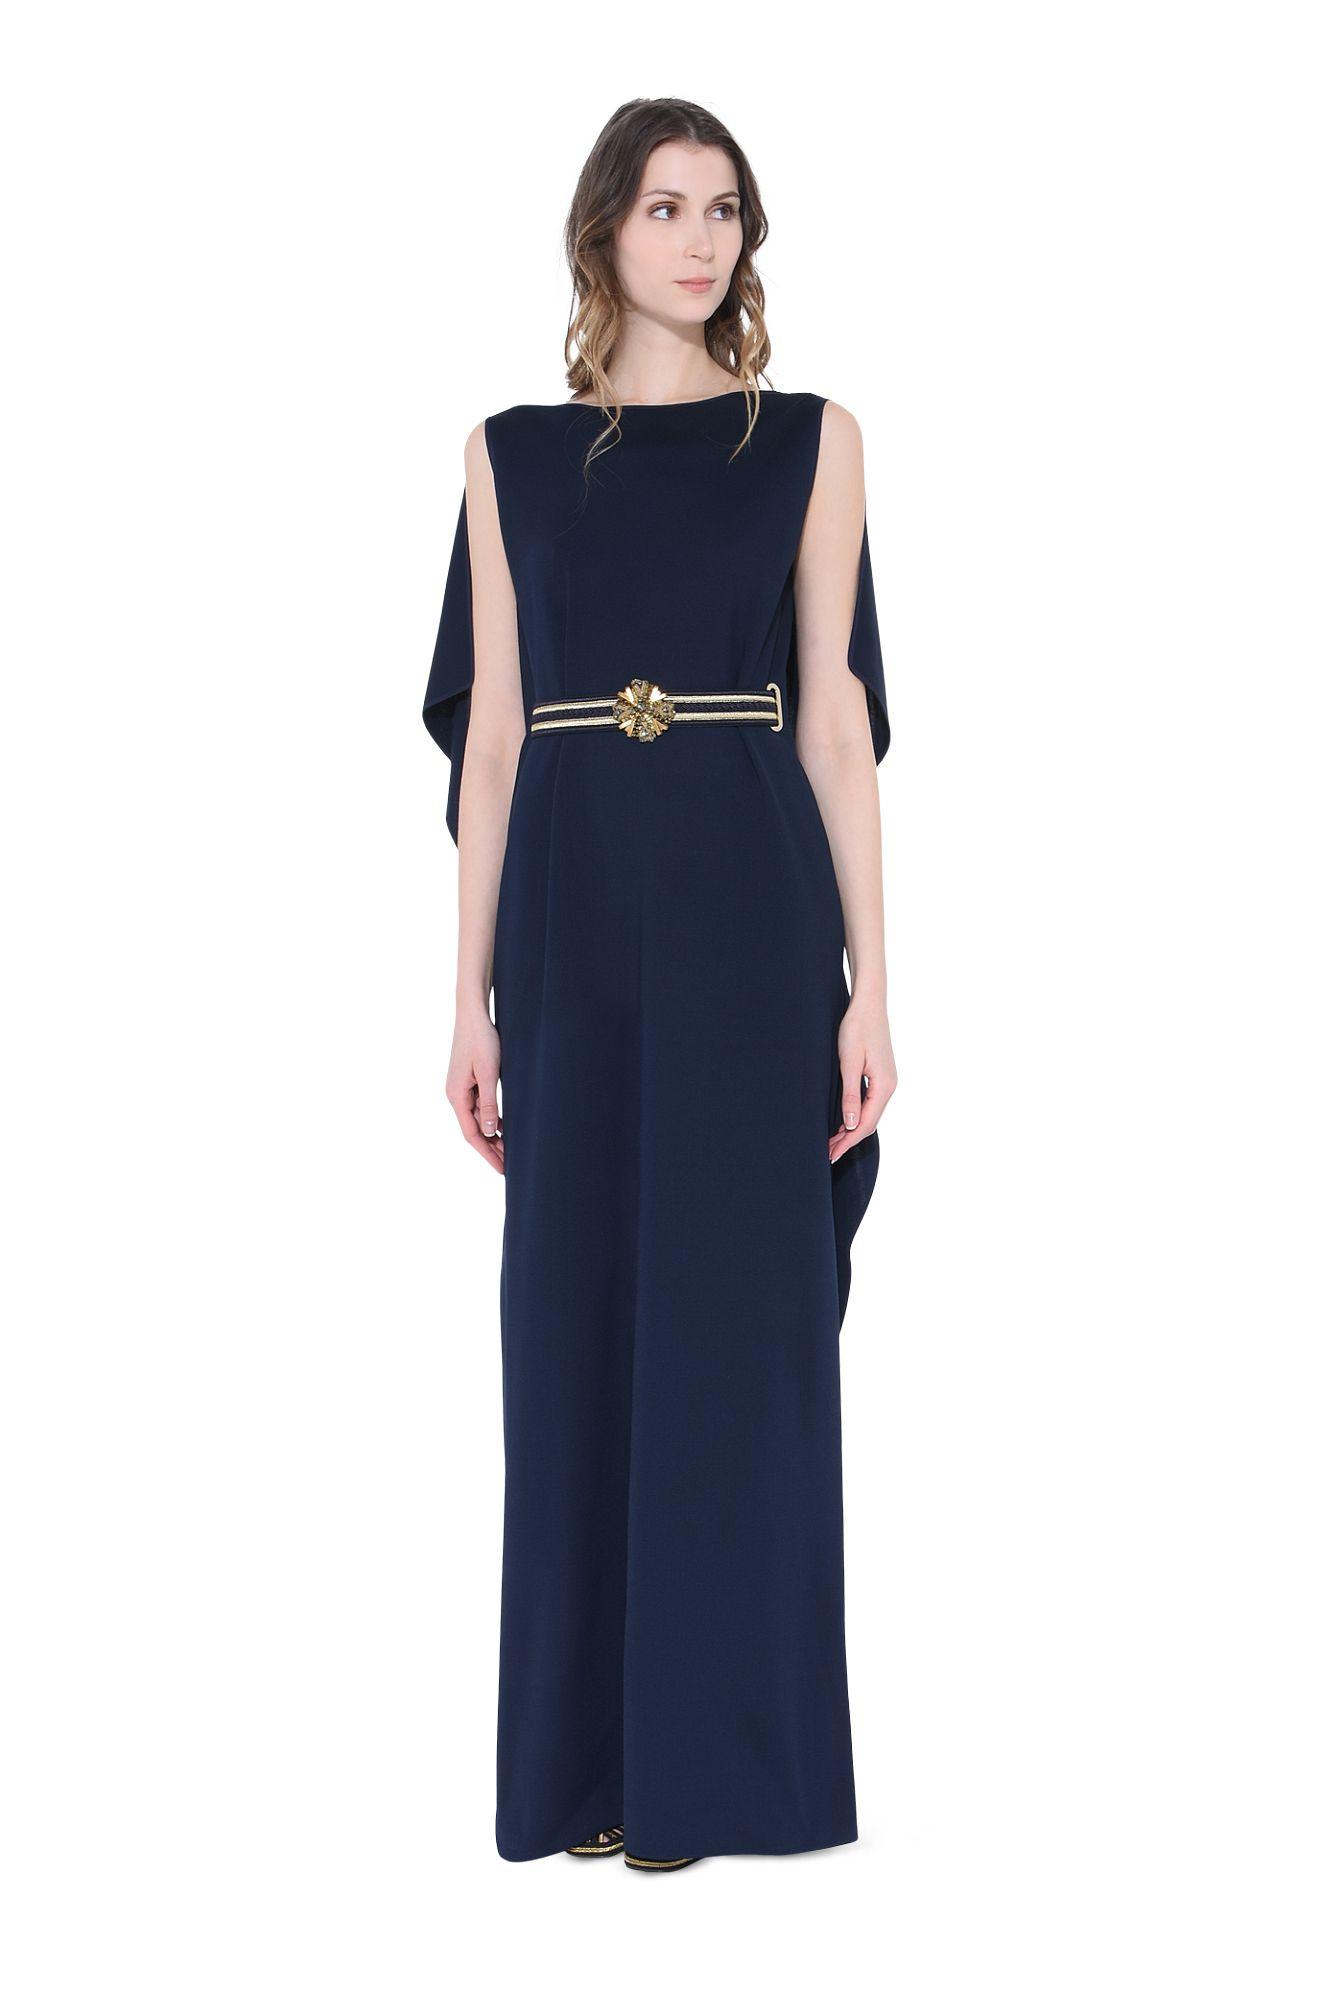 HELLENIC DRESS